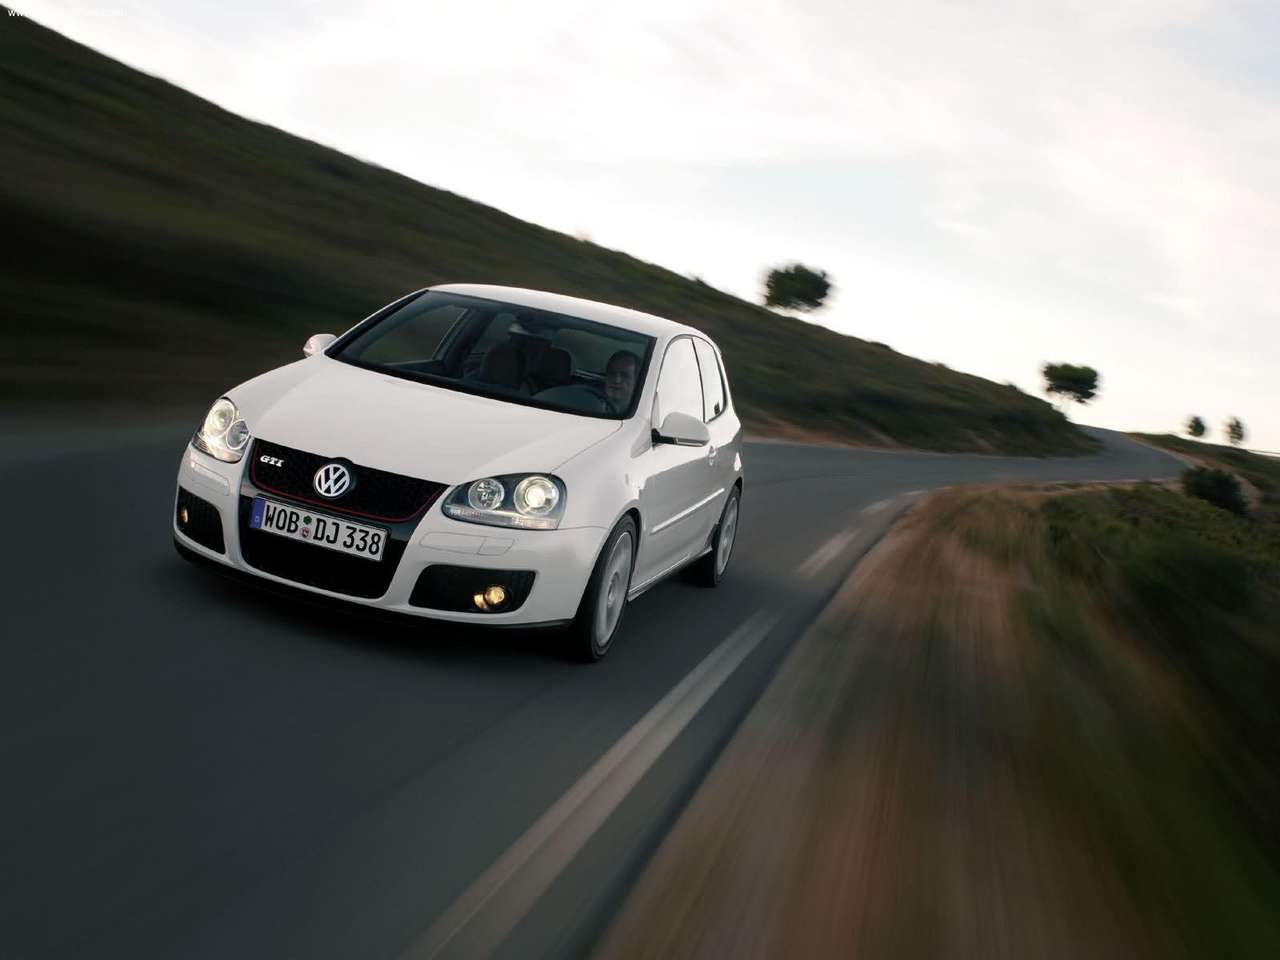 http://1.bp.blogspot.com/_lsyt_wQ2awY/TGKYnyFtAkI/AAAAAAACDhk/IN3VWtIQIGA/s1600/Volkswagen-Golf_GTI_3door_2004_1280x960_wallpaper_01.jpg